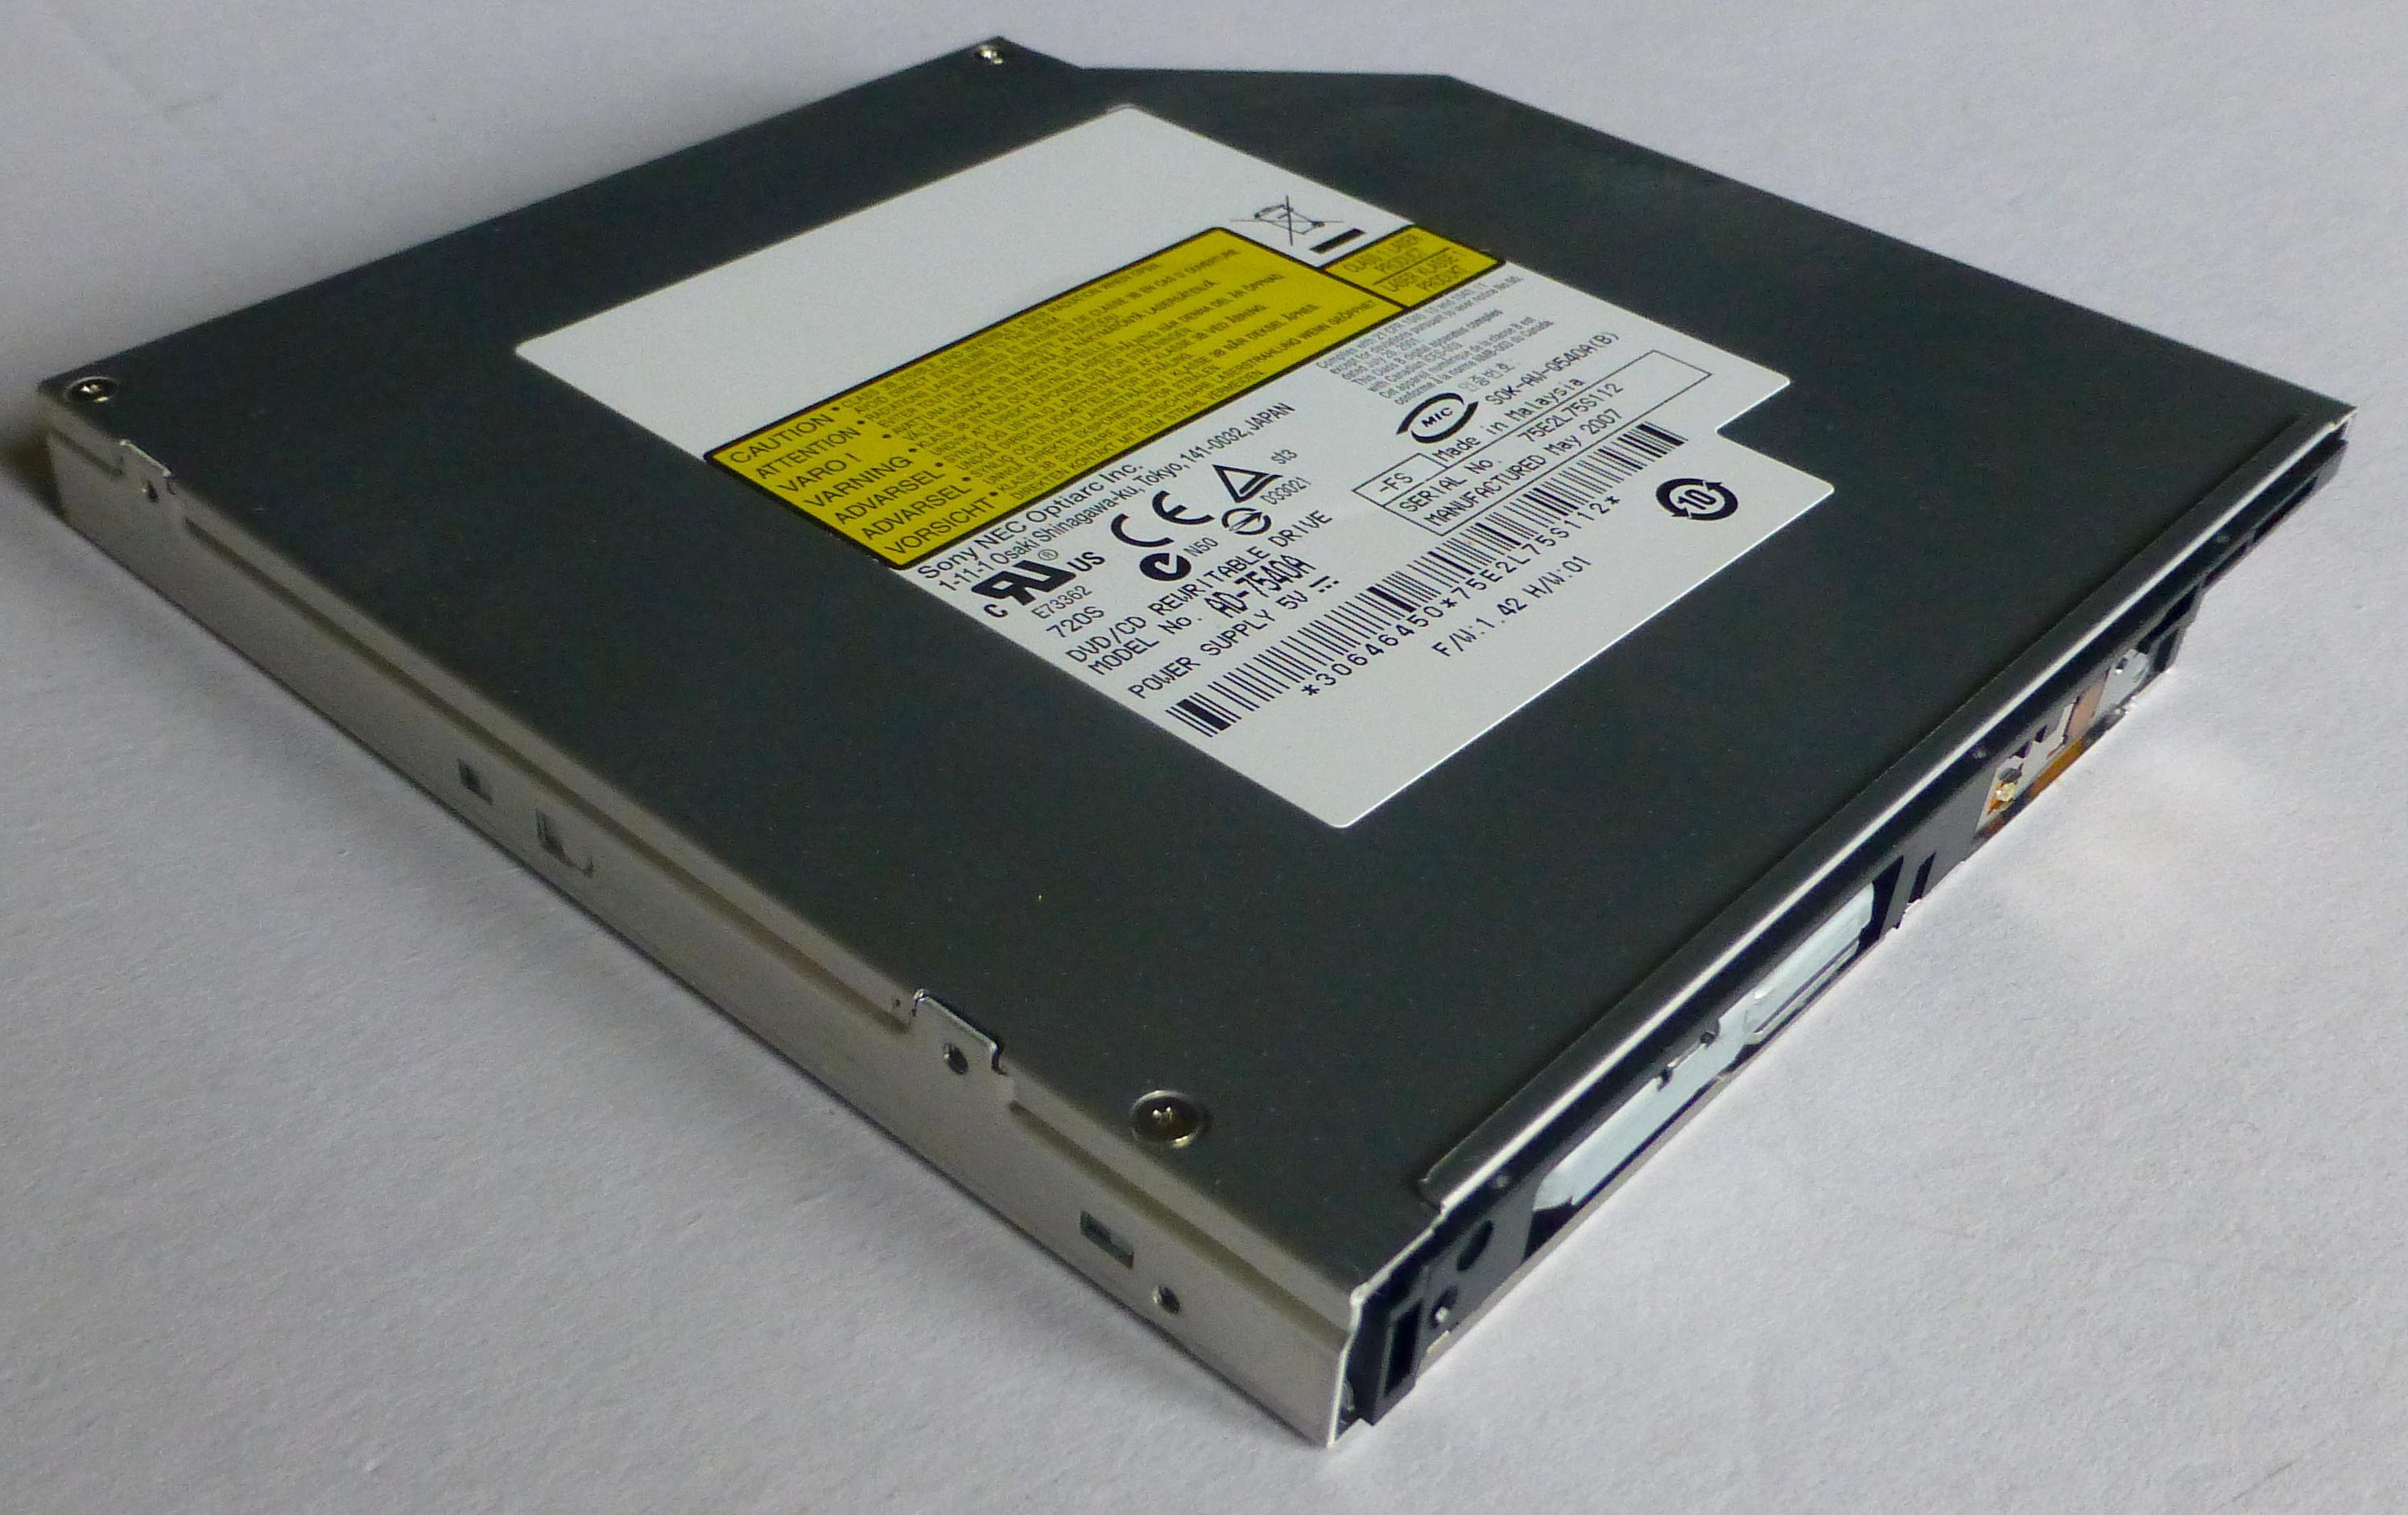 Dvd rw ad-7561a ata device